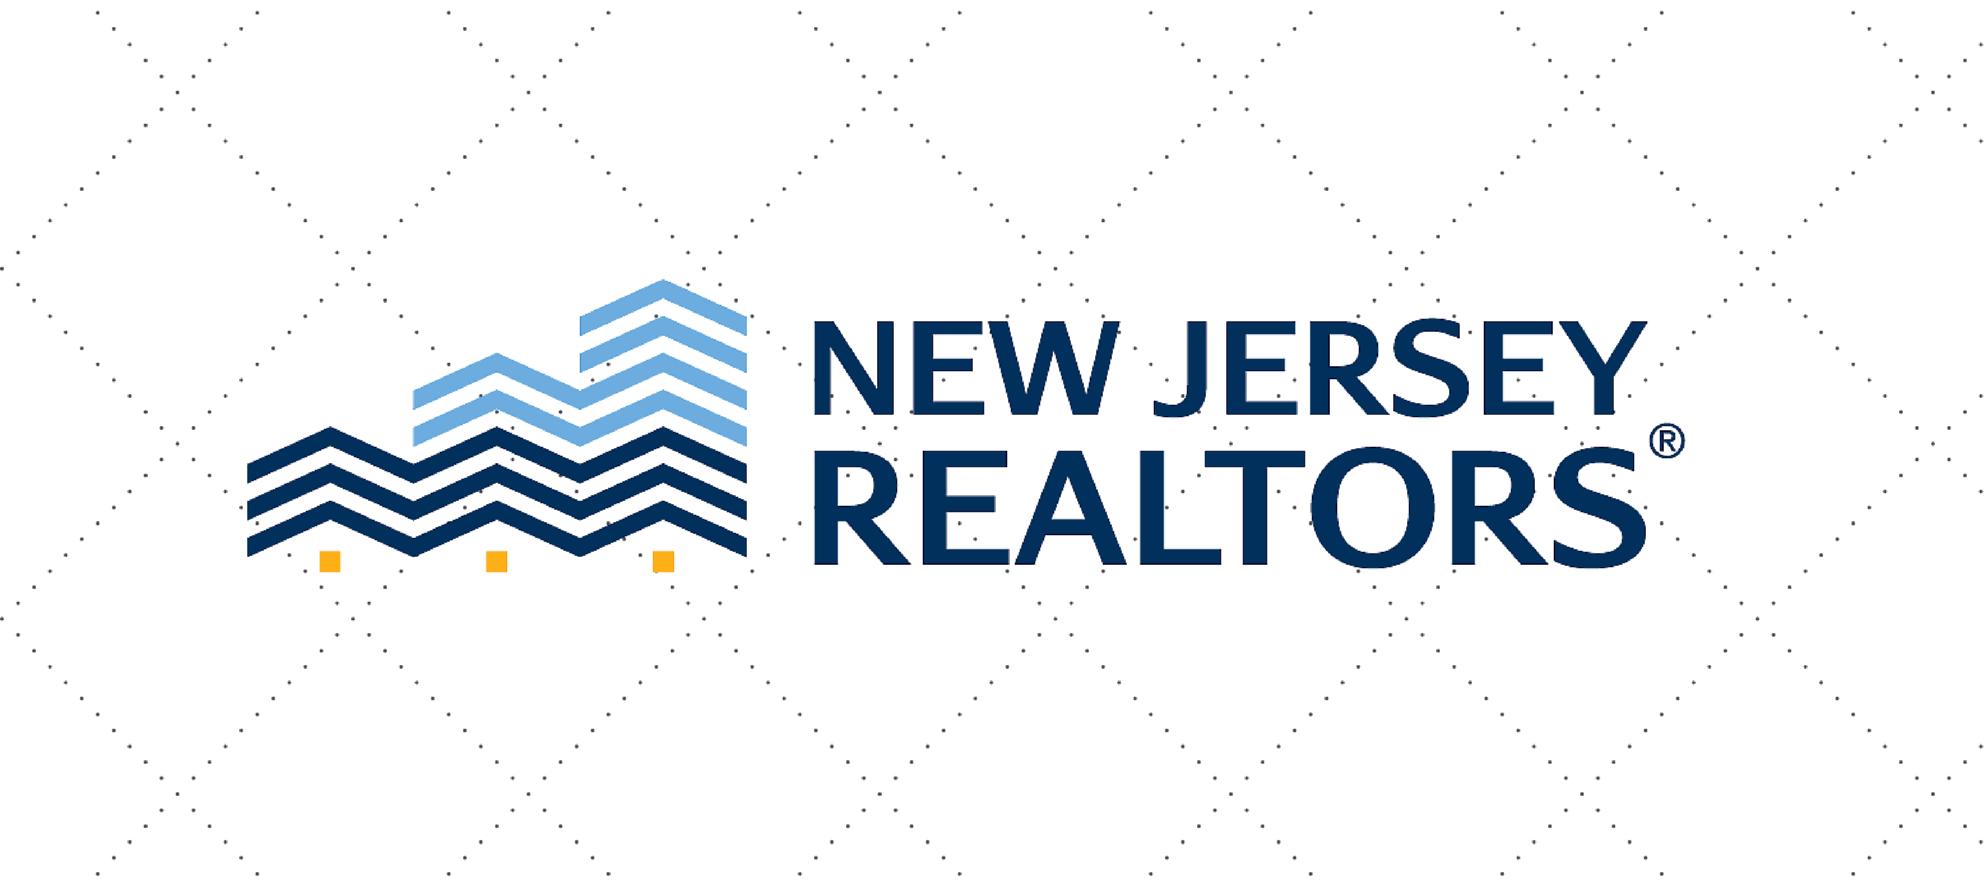 New Jersey's Realtor association rebrands